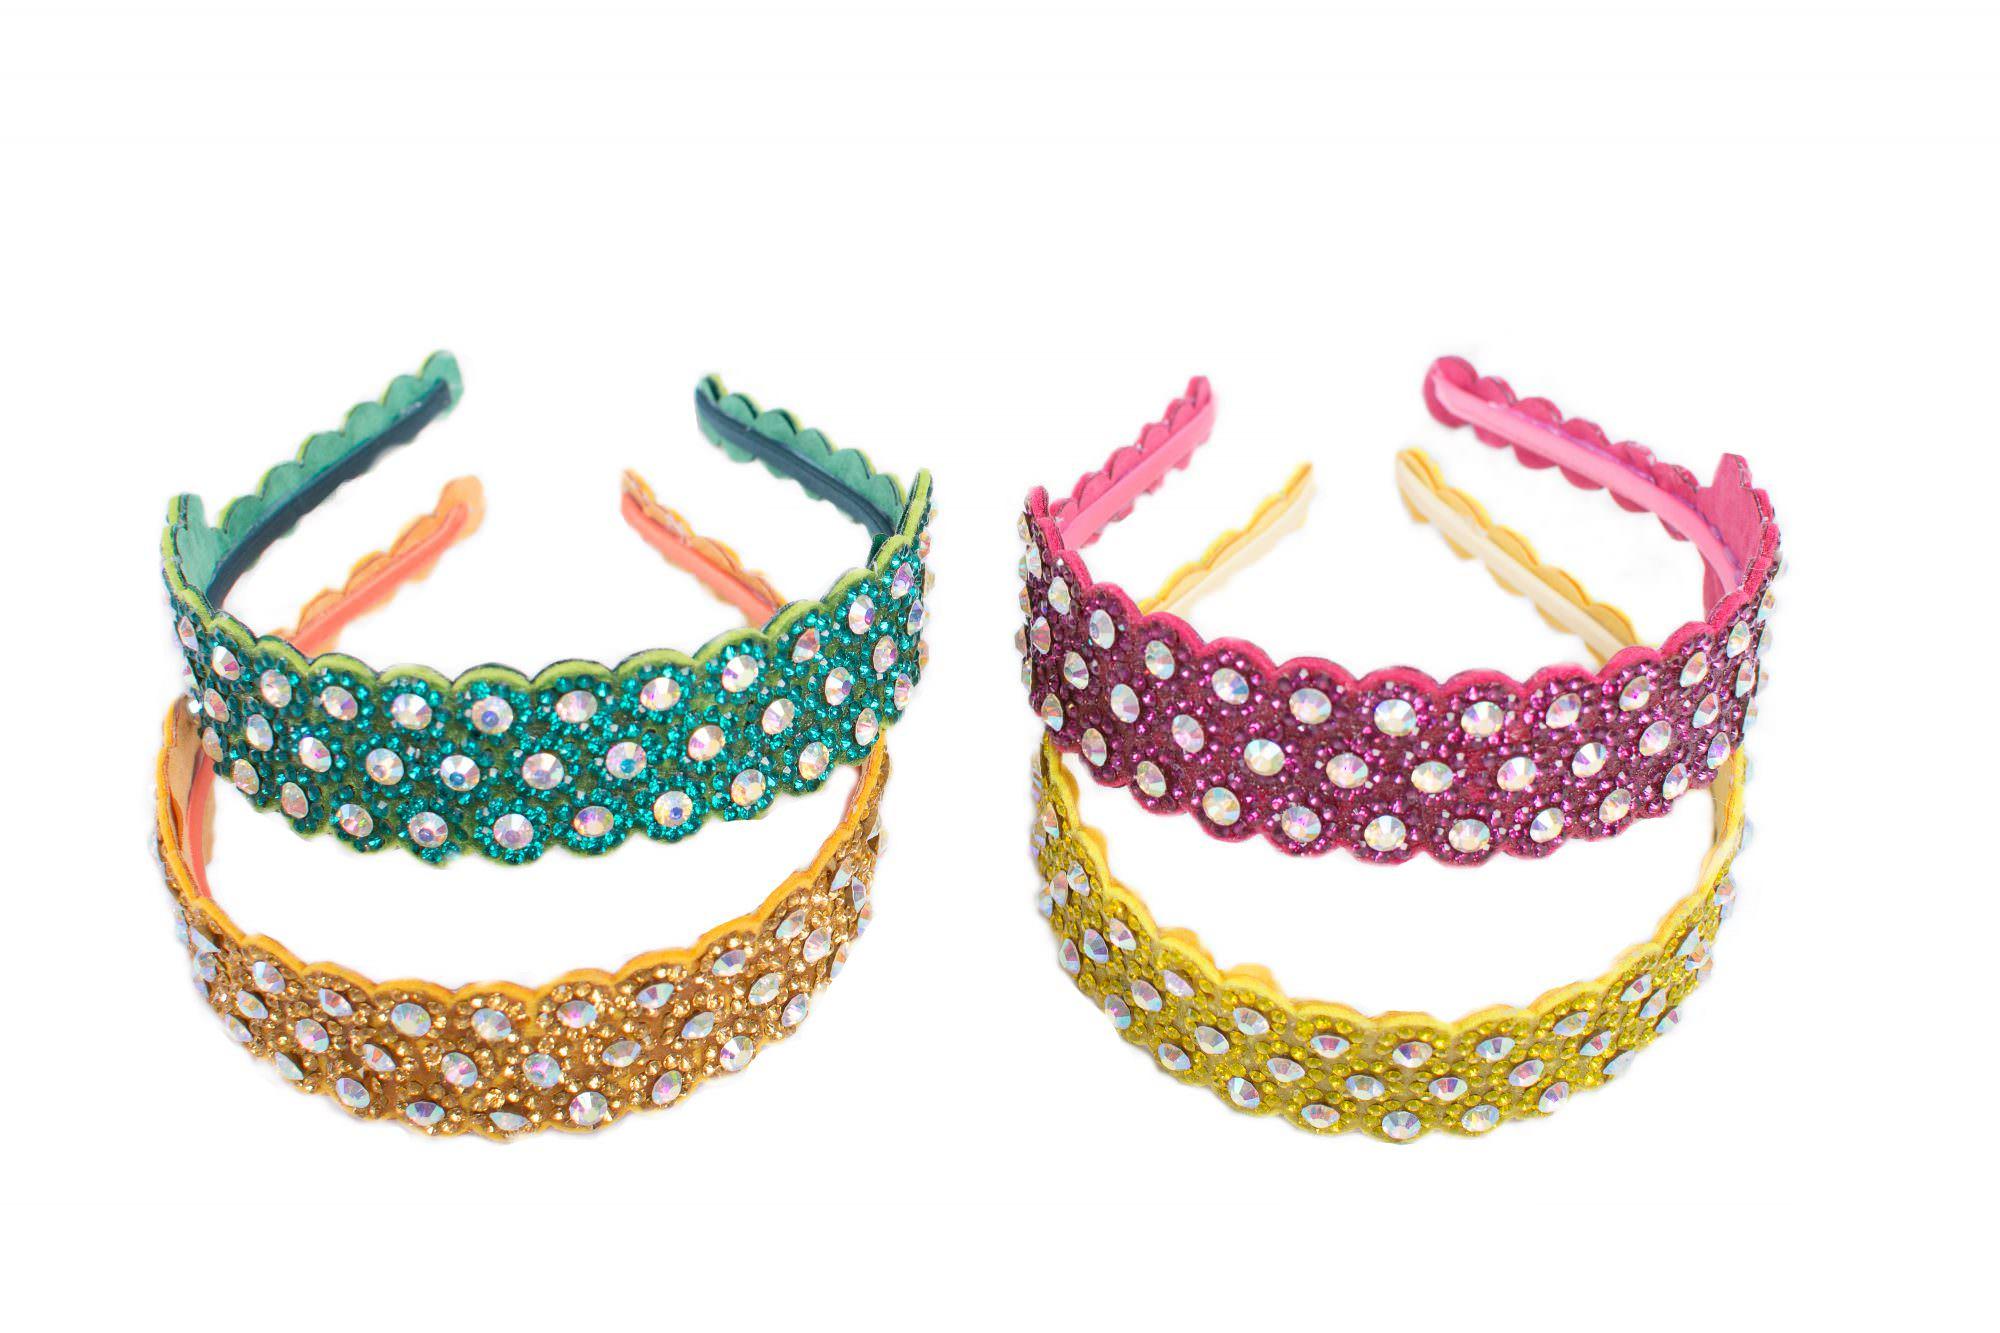 Ariel Headband Group